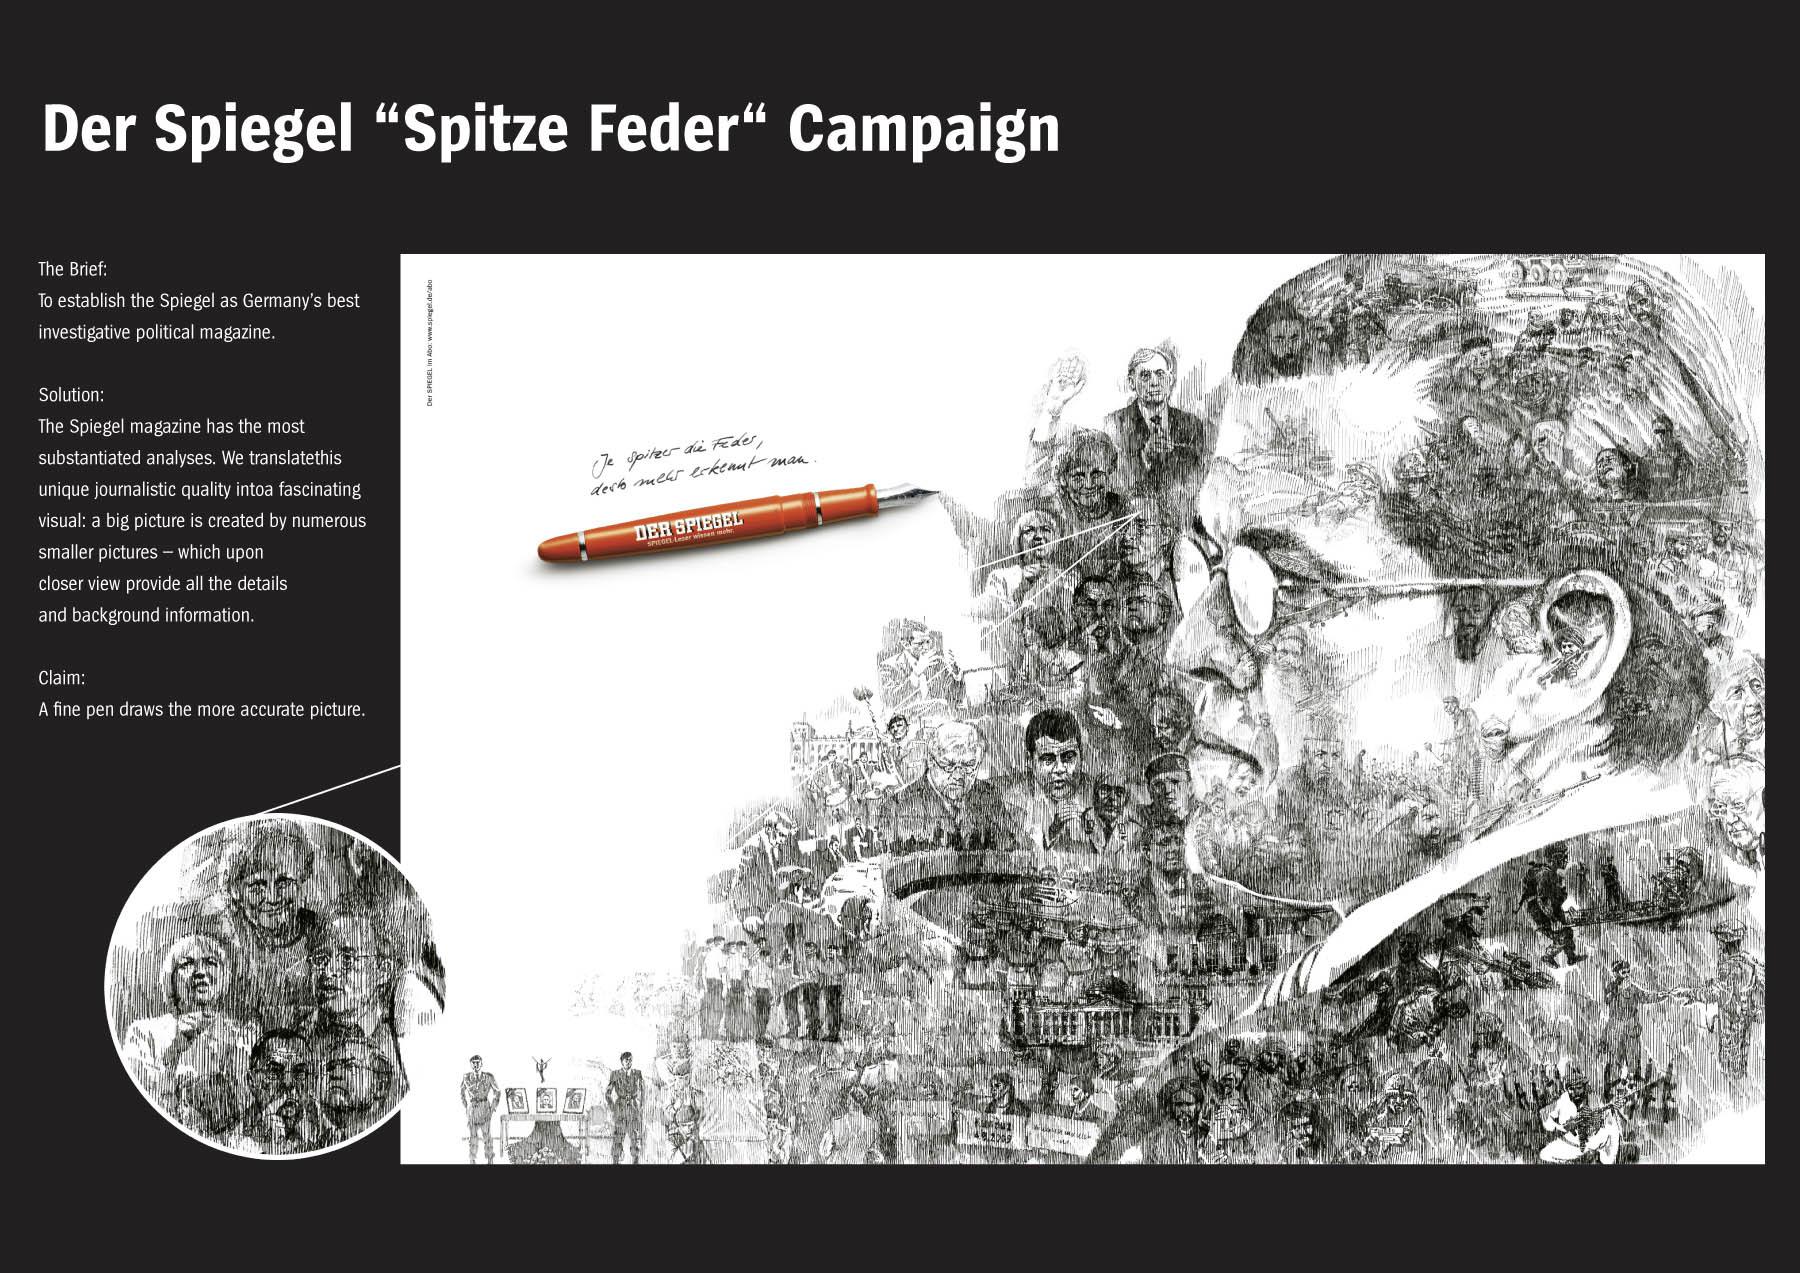 Spiegel Spitze Feder Kampagne